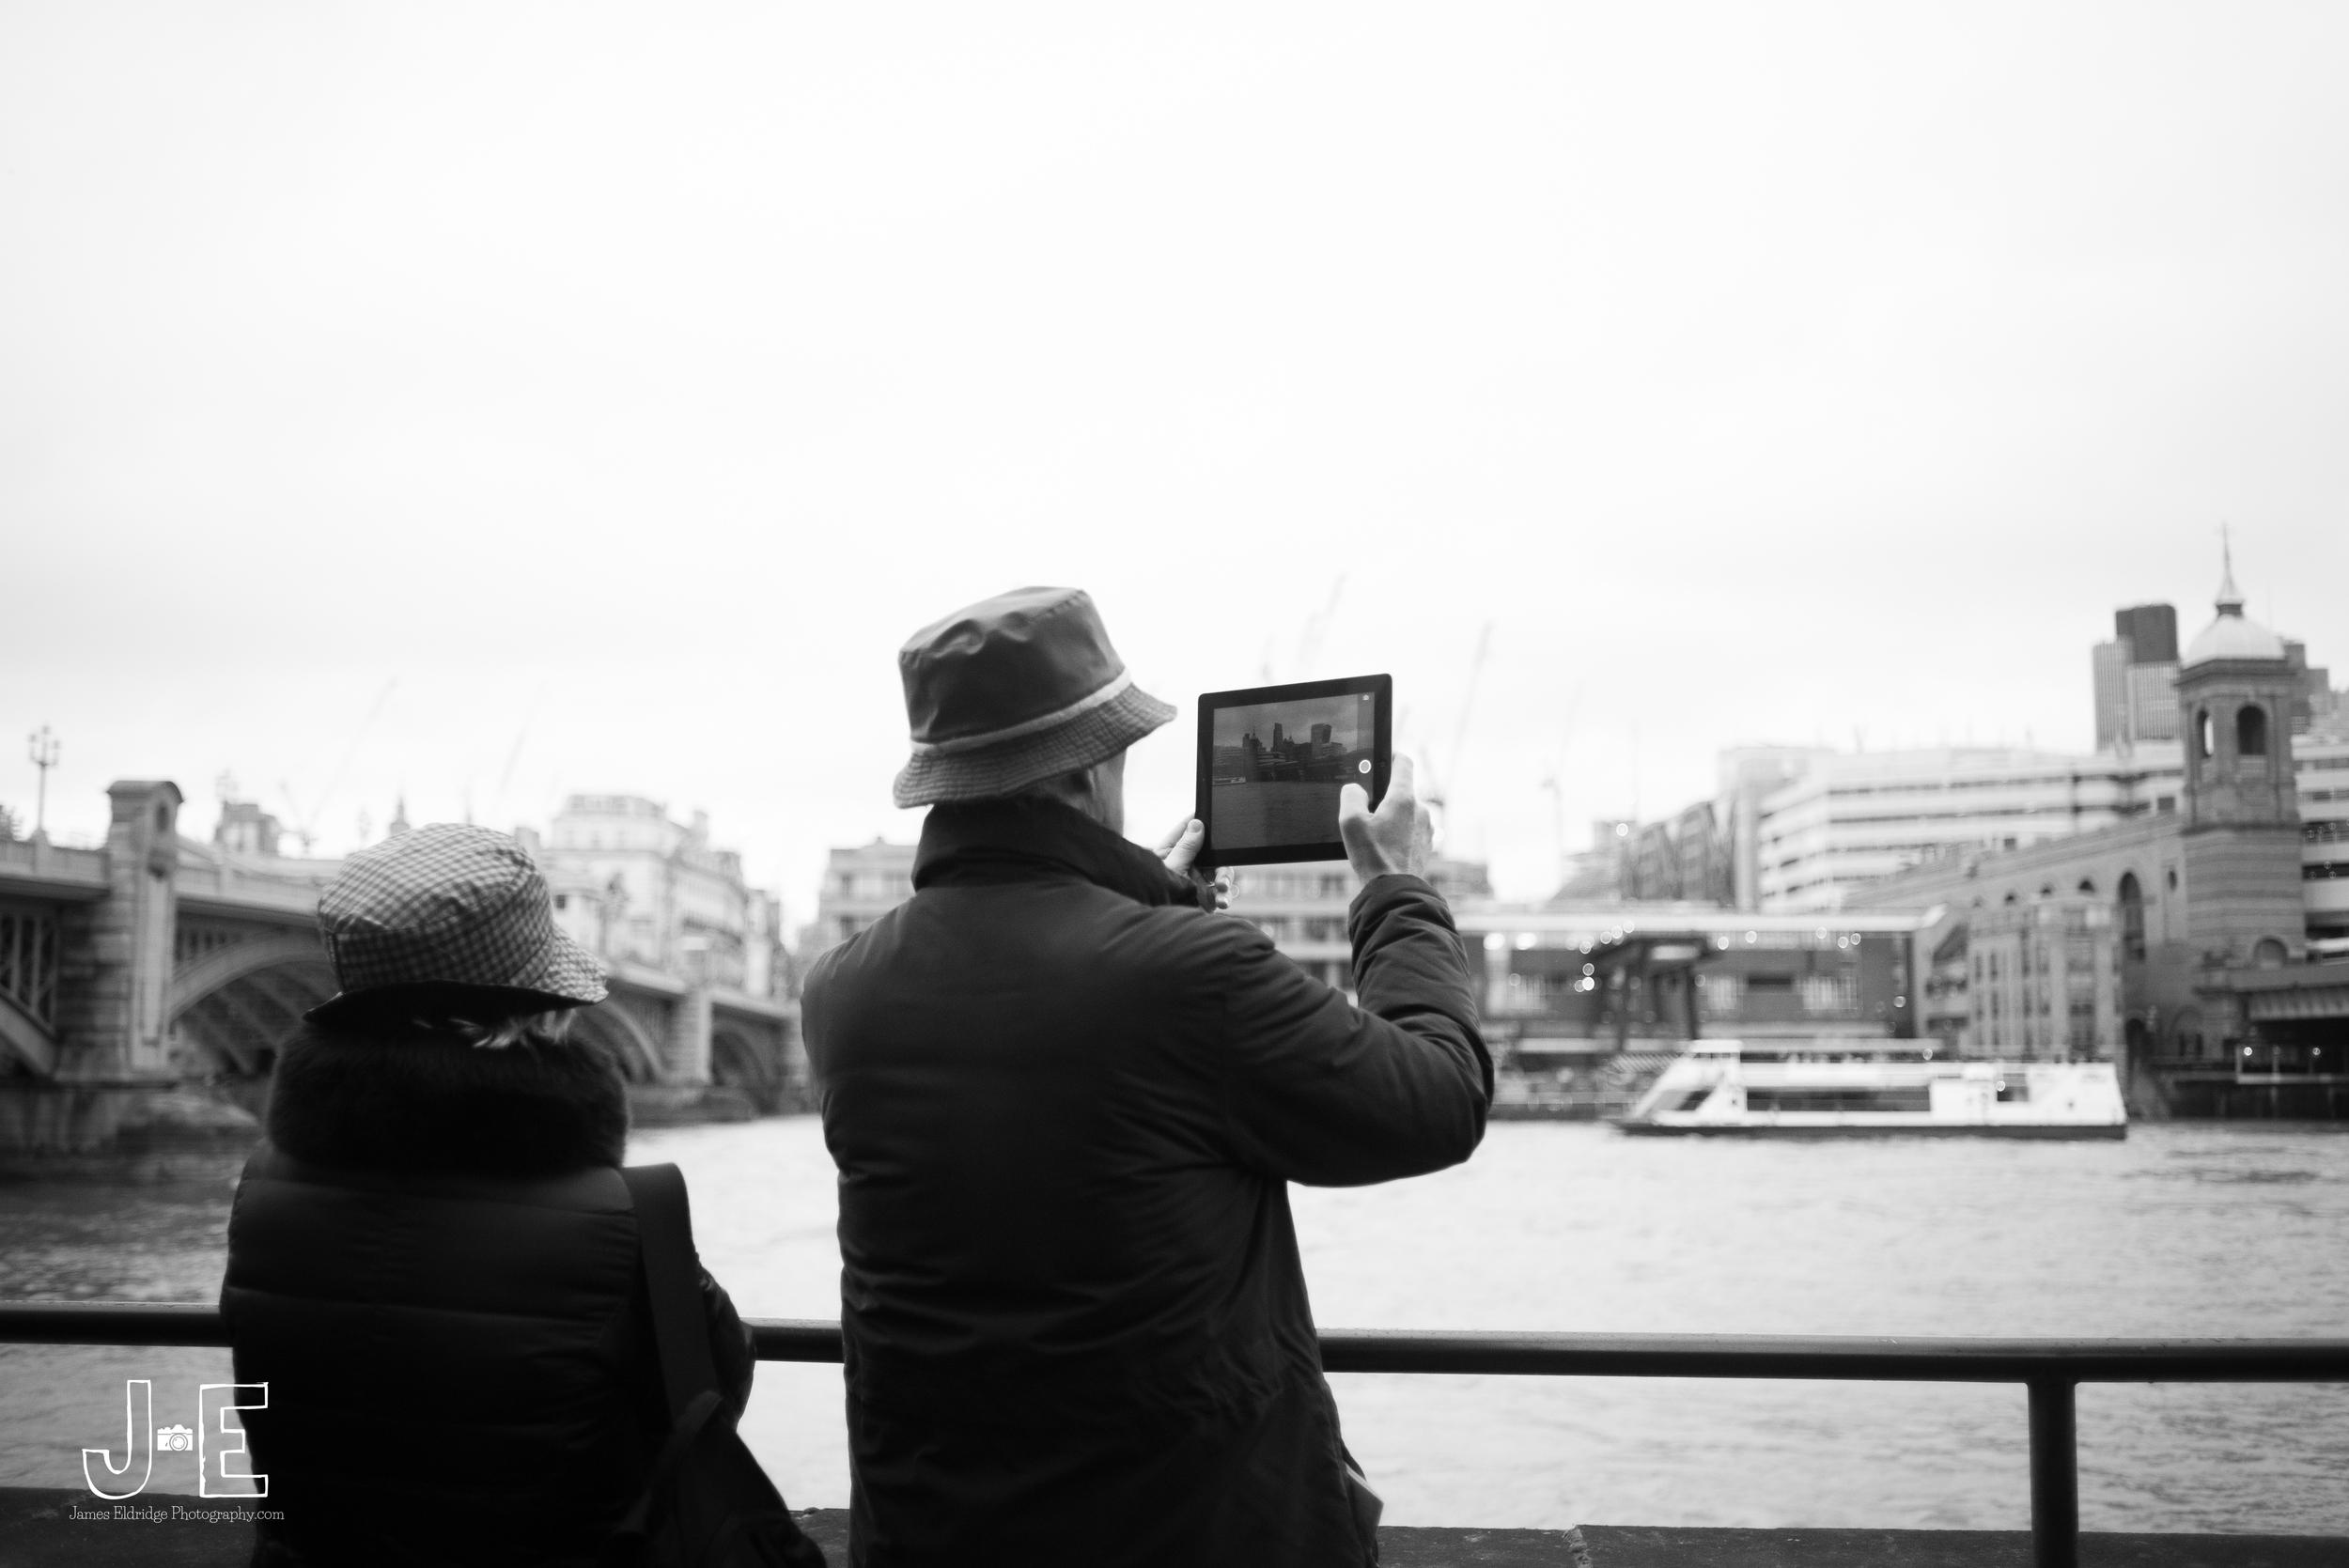 London ipad photography